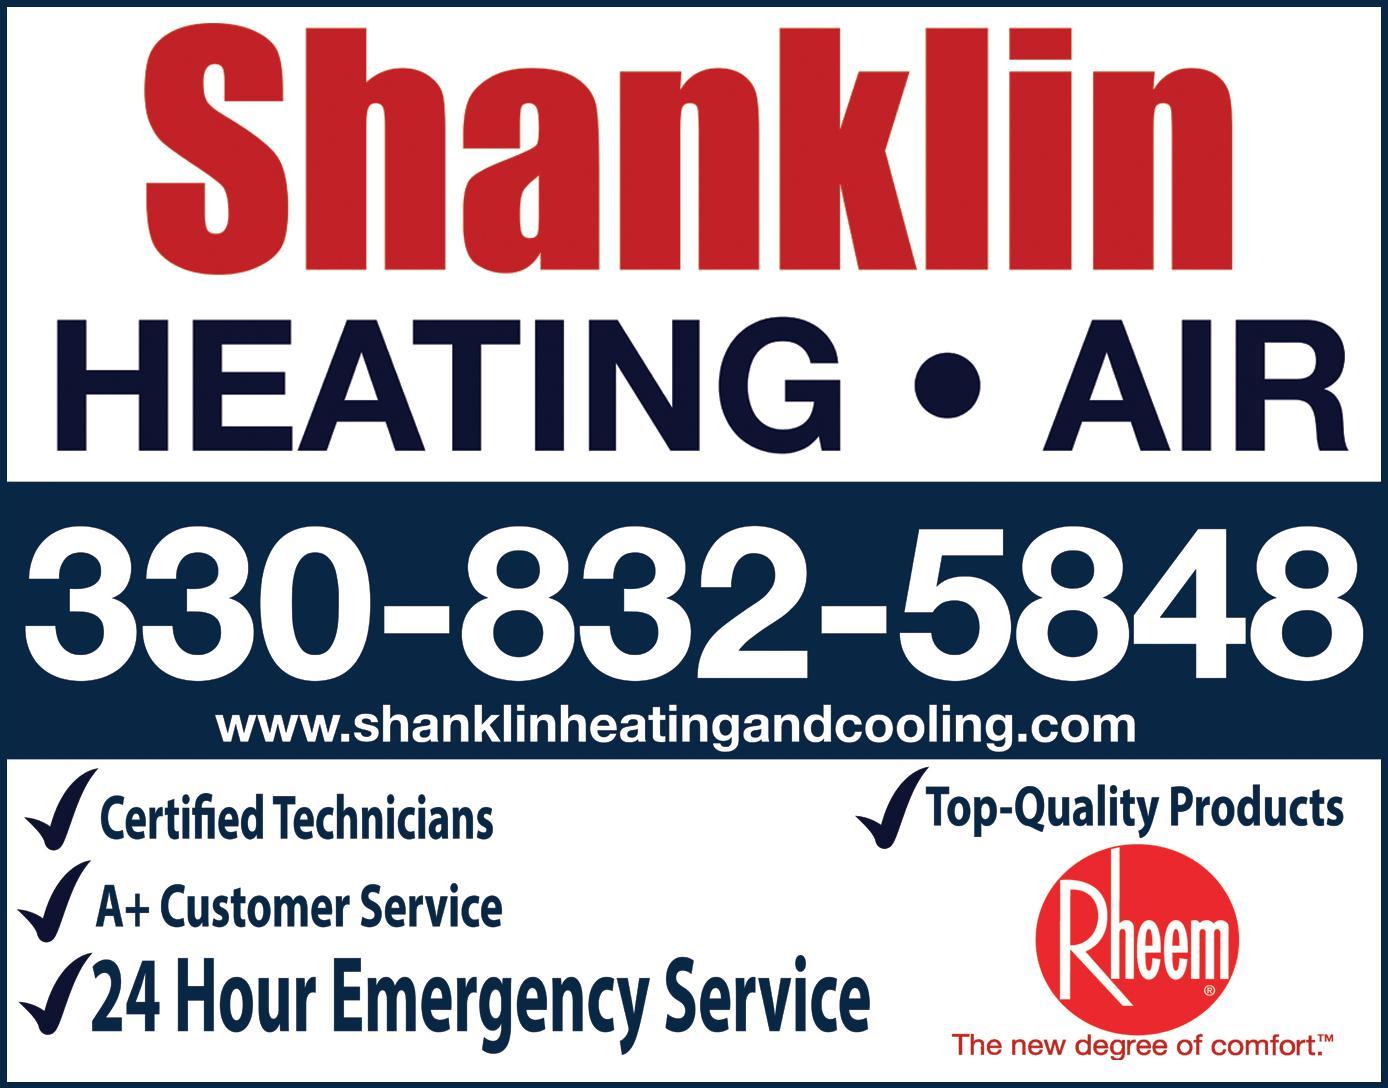 Shanklin Heating, Air Conditioning, LLC